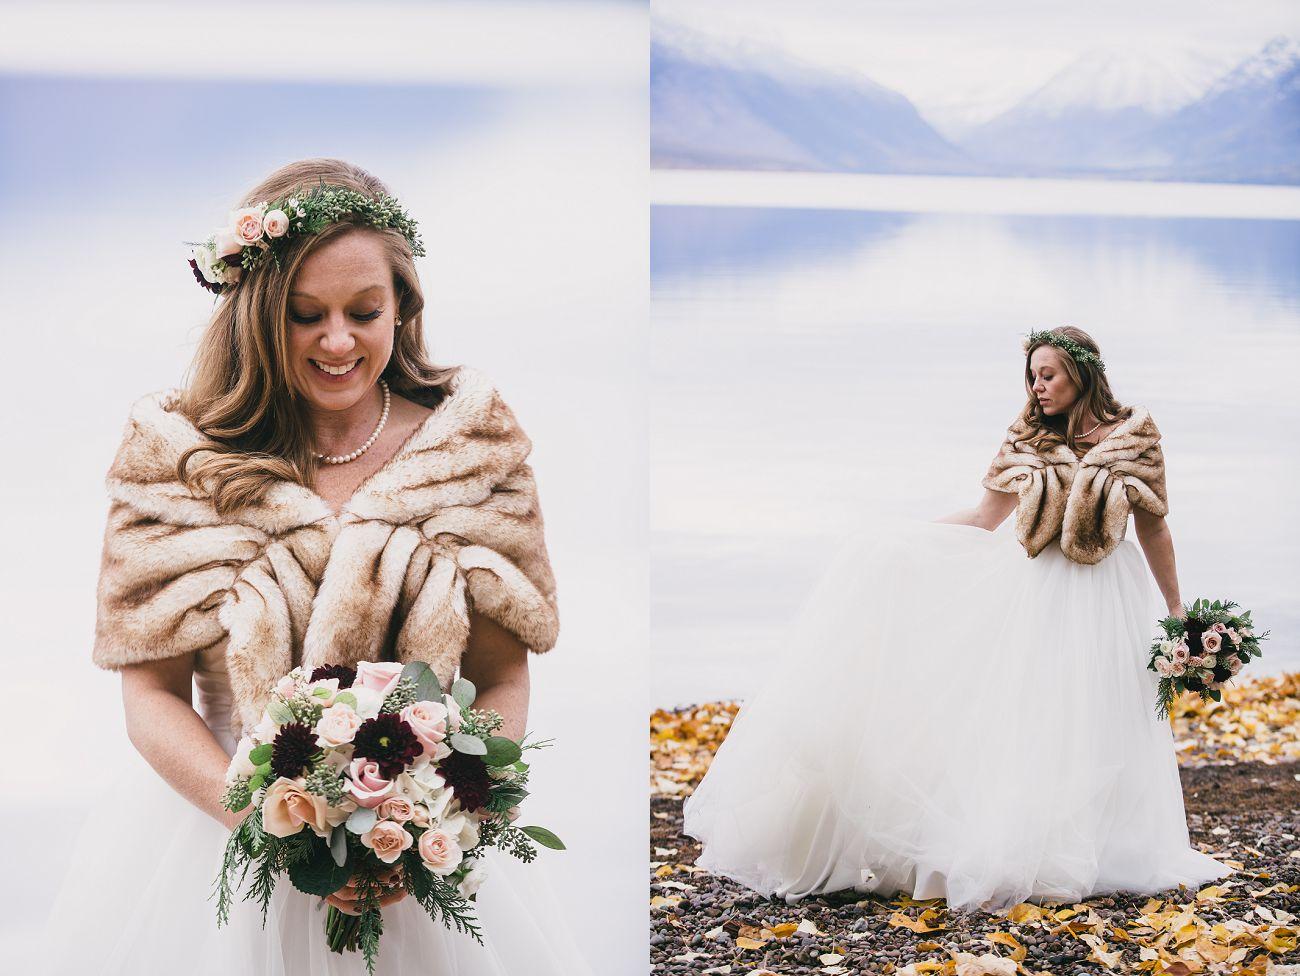 Jennifer_Mooney_Photo_Whitefish_mountain_resort_wedding_elegant_montana_wedding_046.jpg